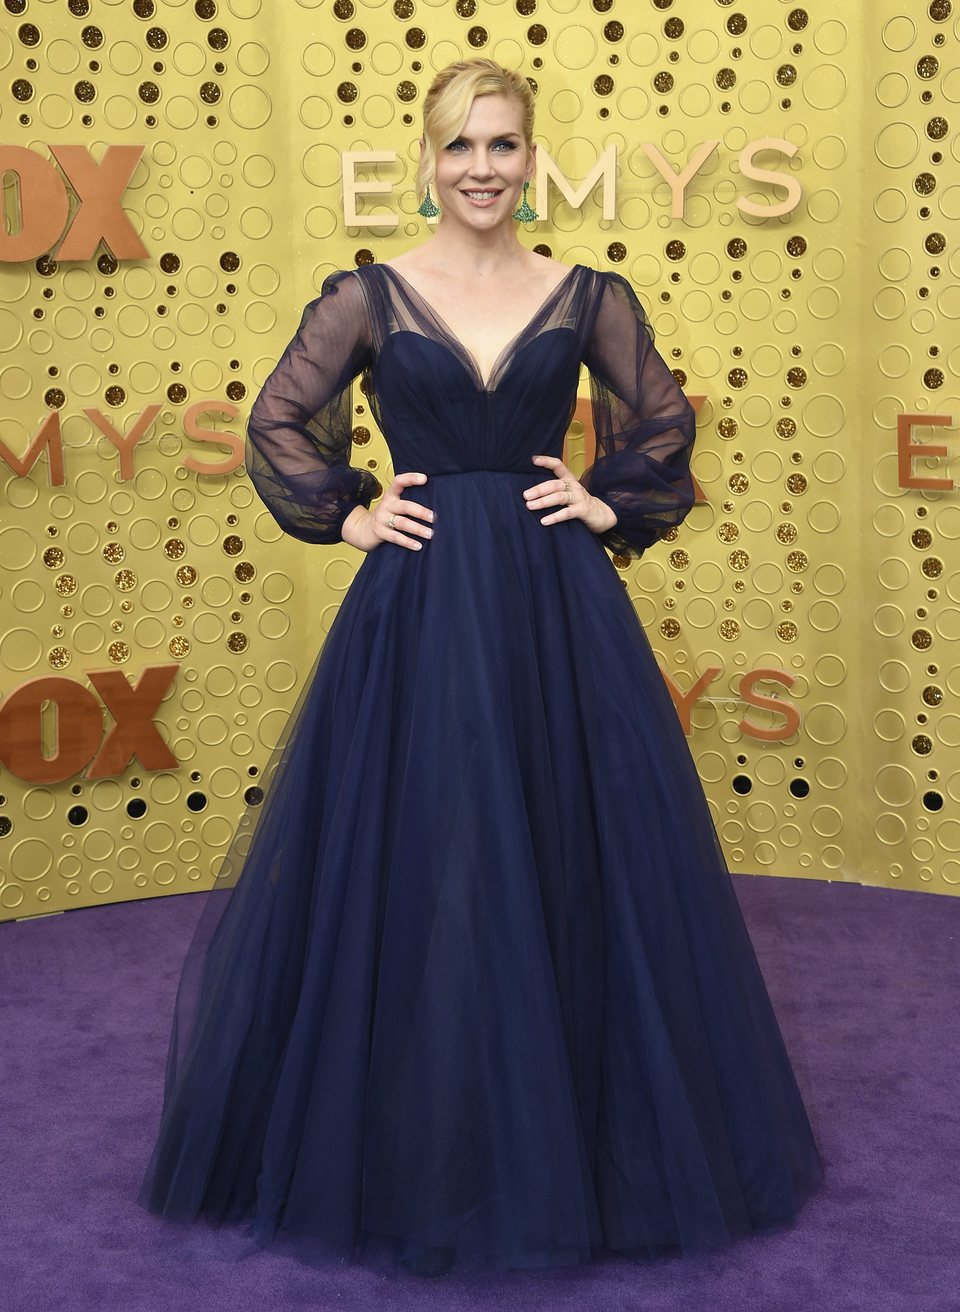 Rhea Seehorn arrives at the 71st Primetime Emmy Awards